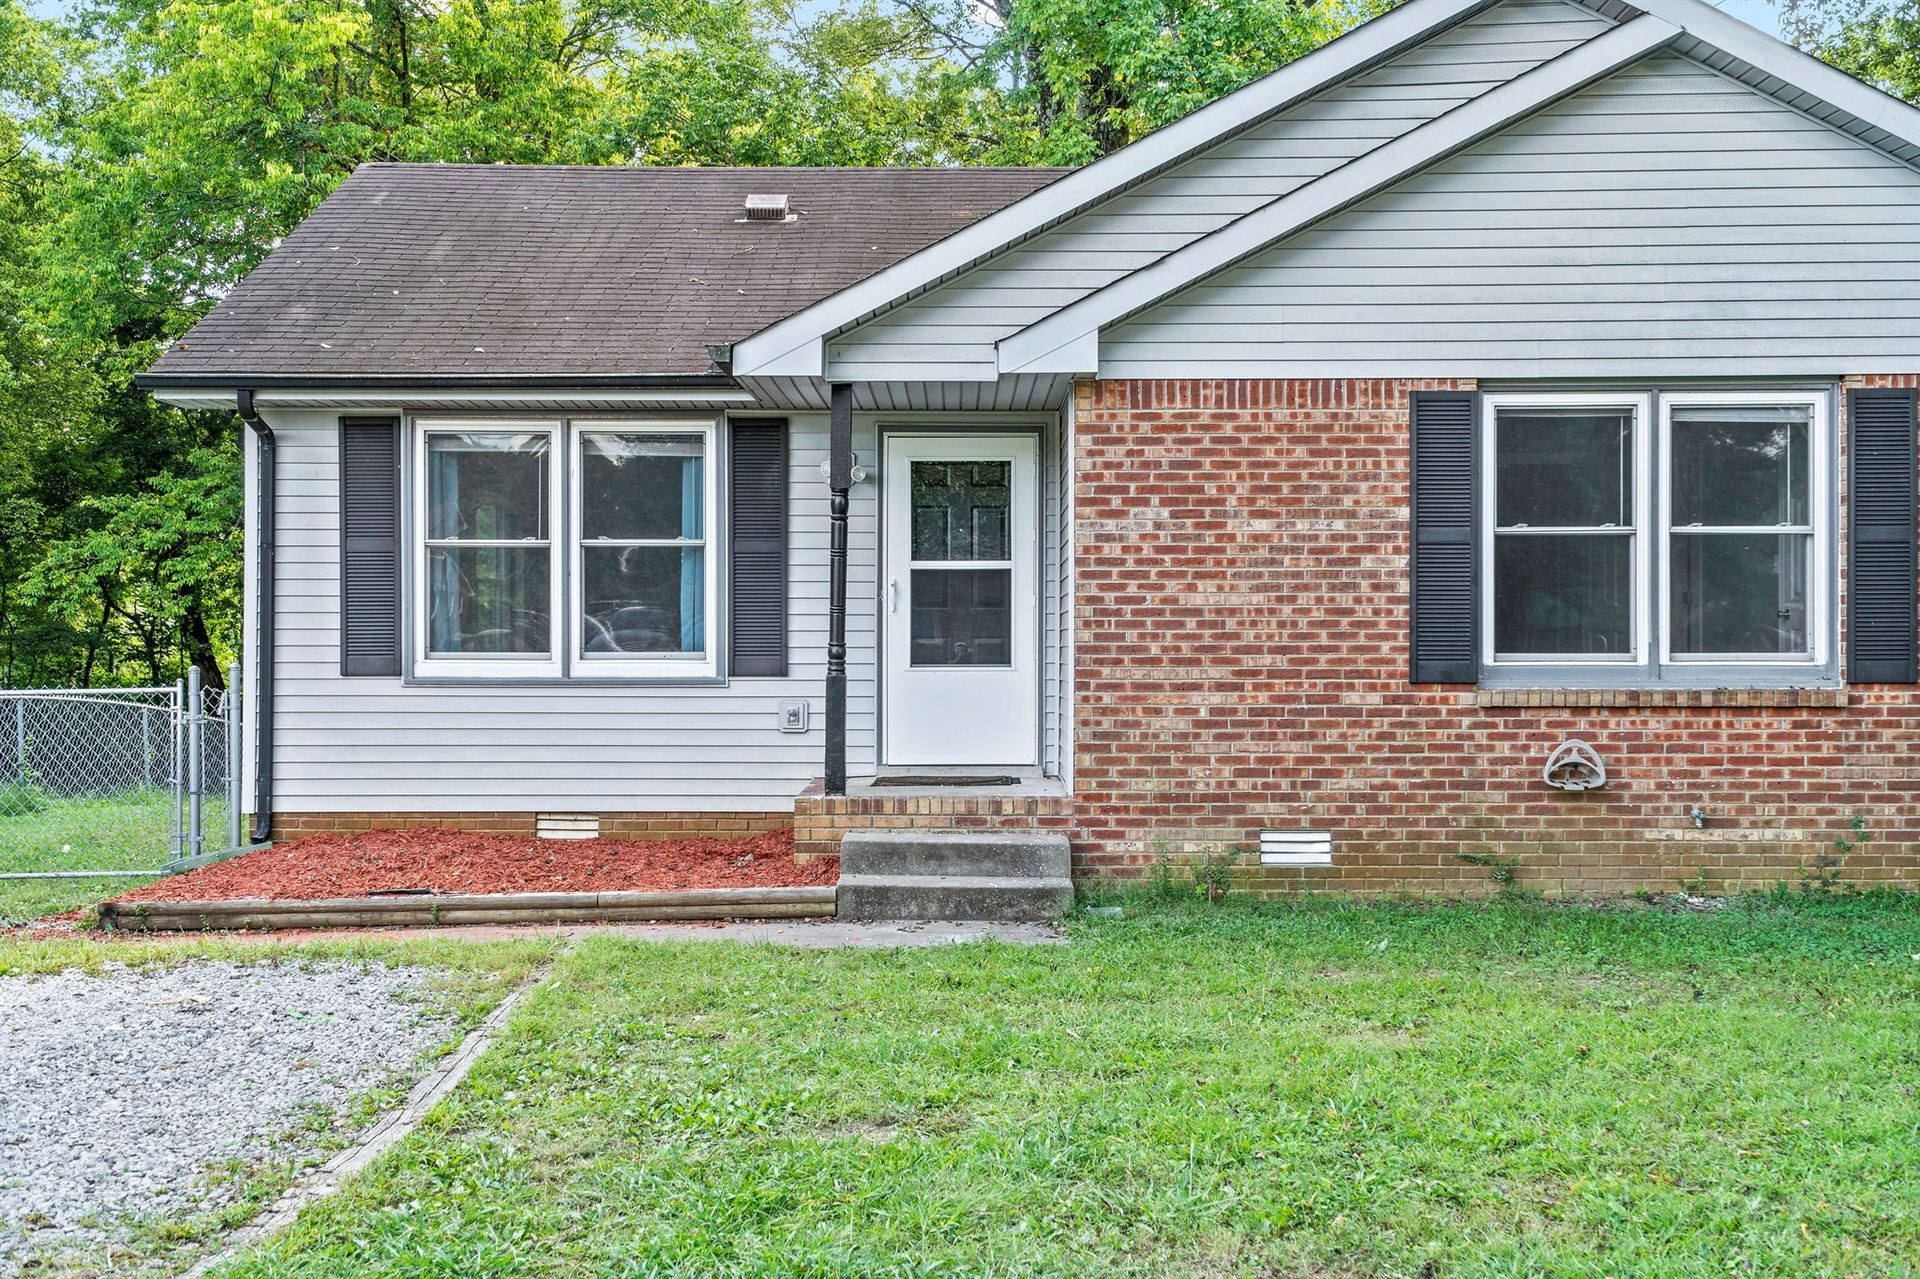 742 Needmore Rd, Clarksville, TN 37040 - MLS#: 2291476